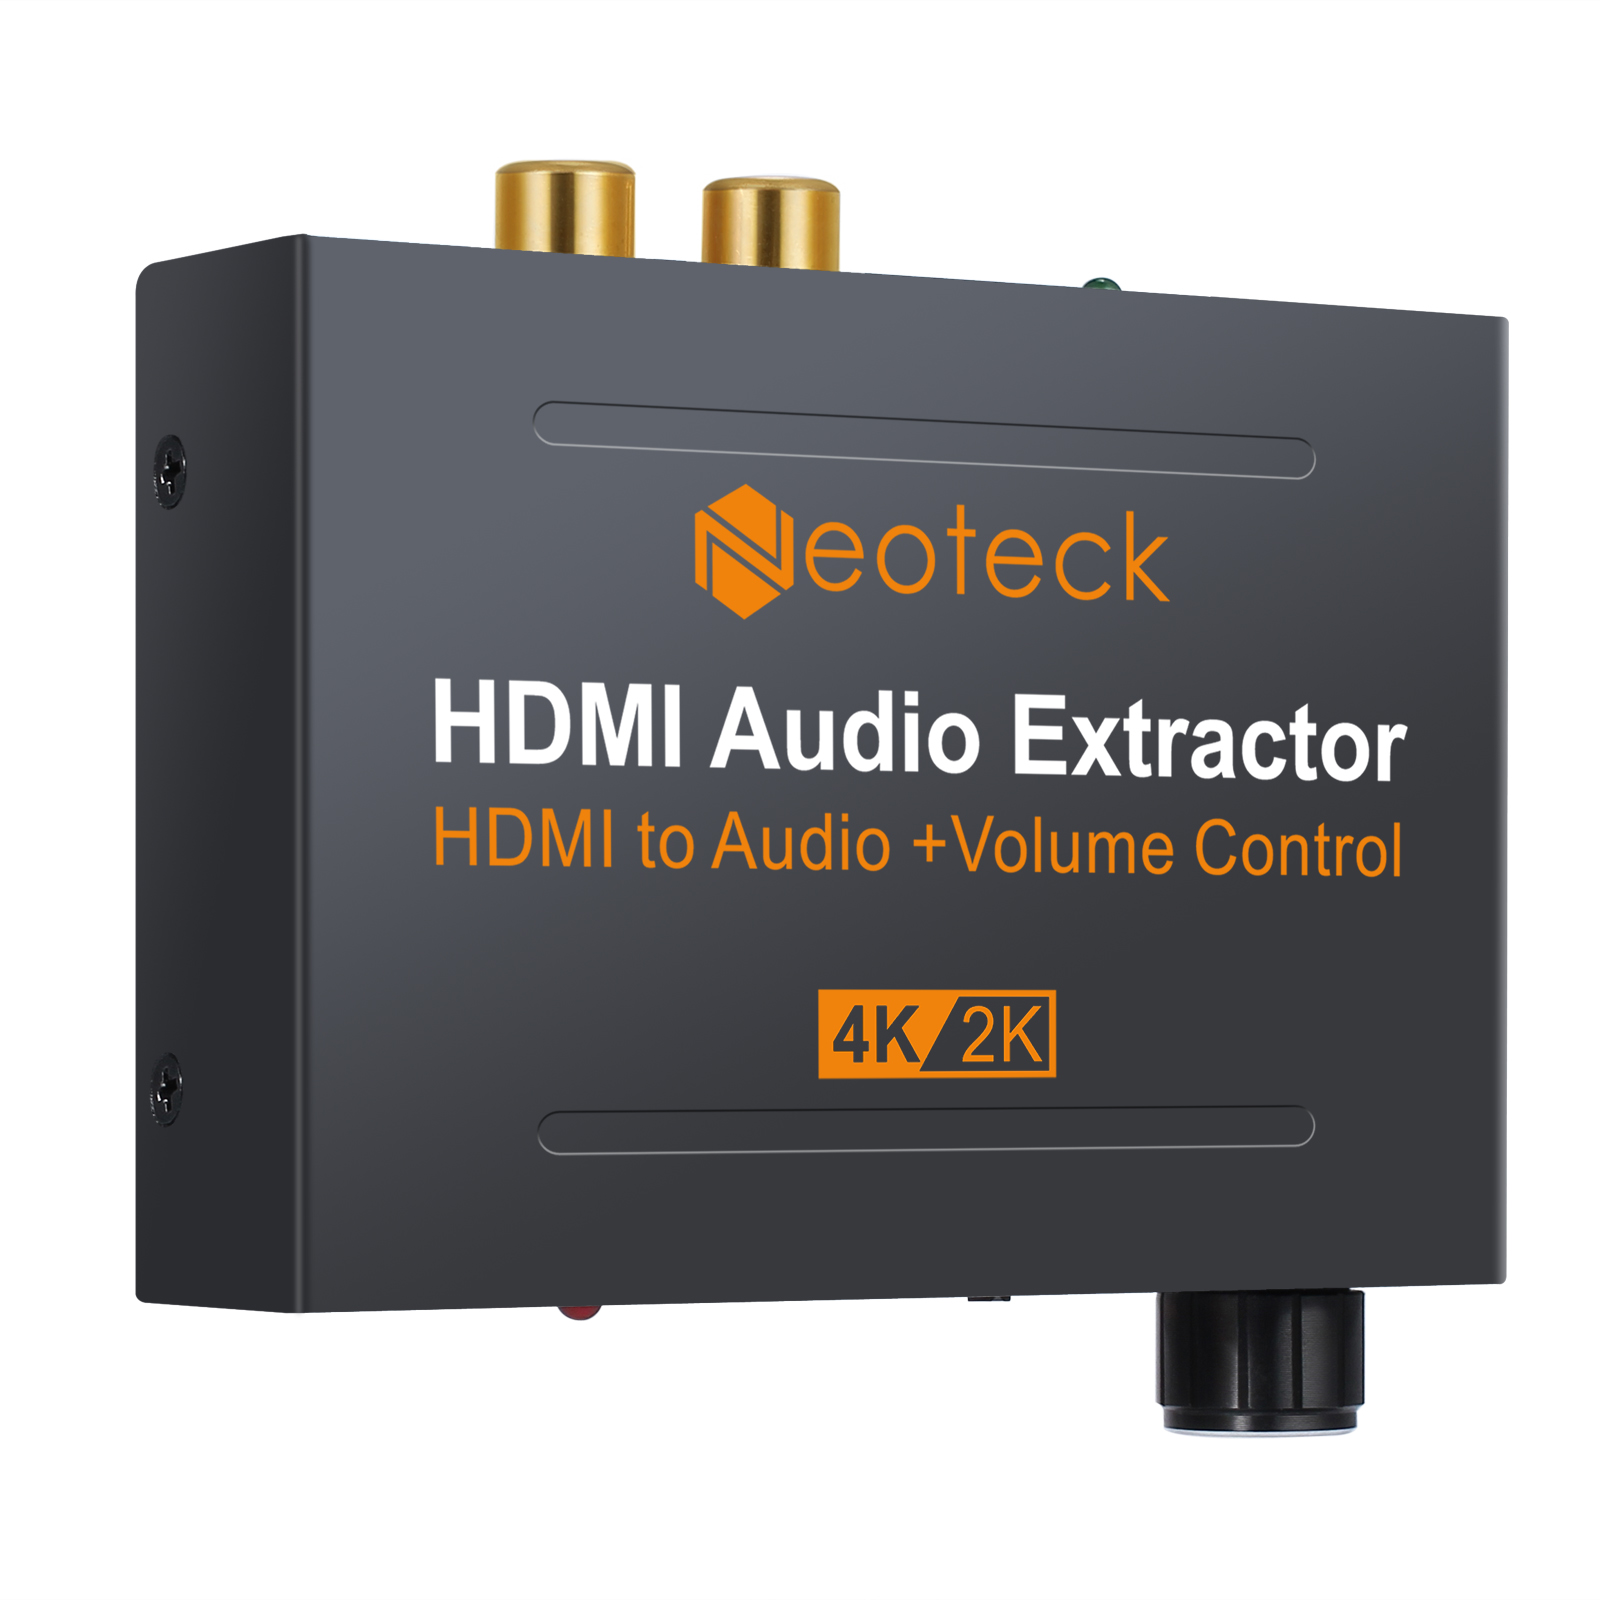 hdmi audio extractor 4k x 2k stereo extraktor mit. Black Bedroom Furniture Sets. Home Design Ideas